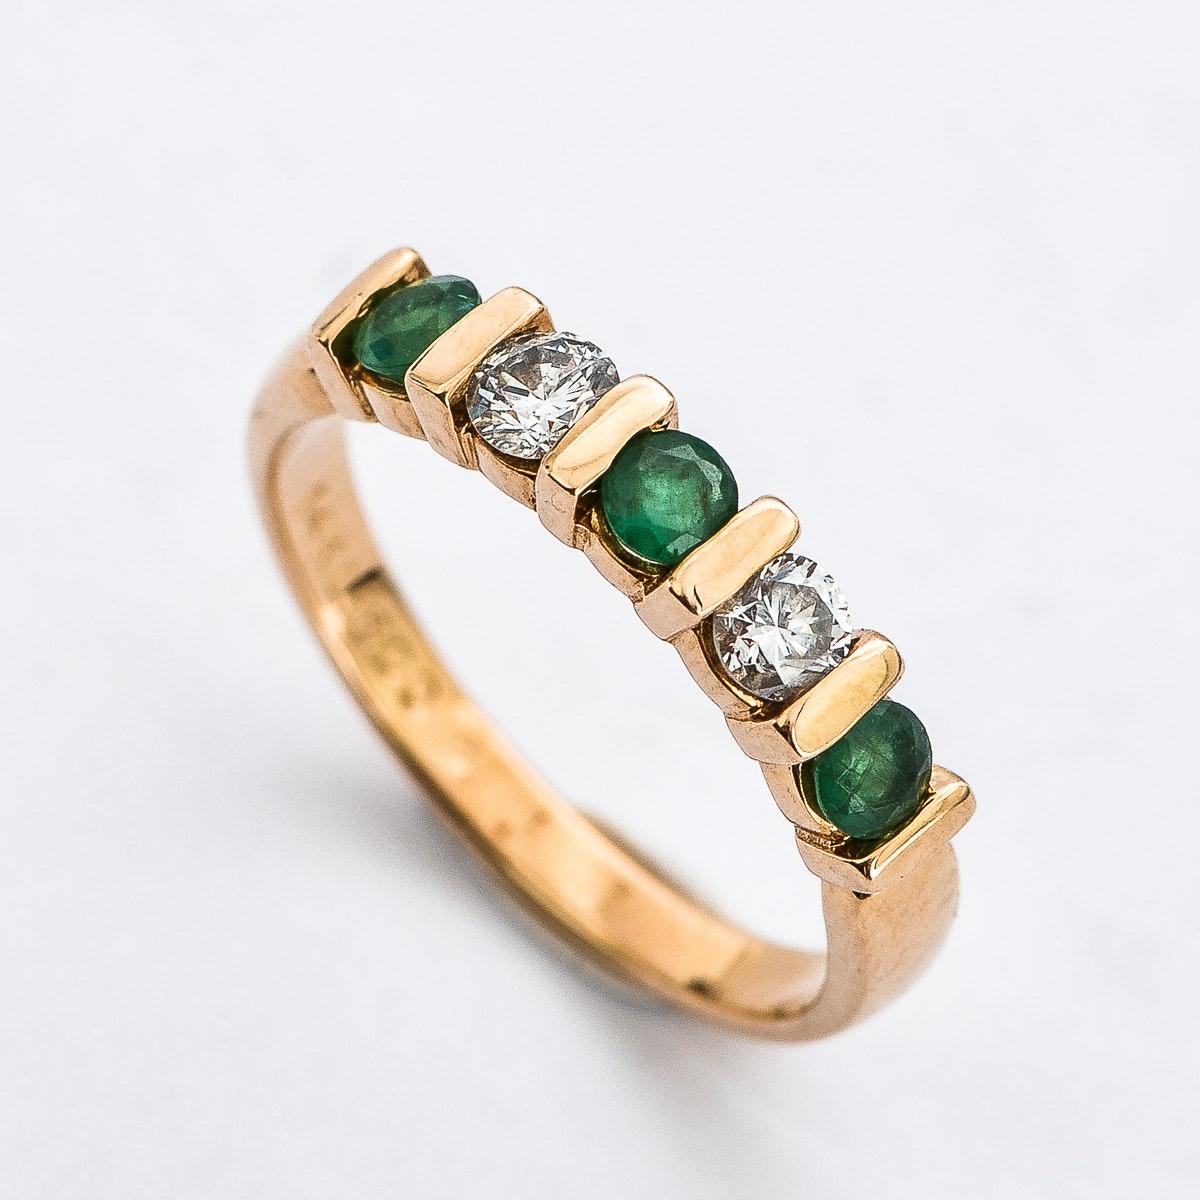 14K Yellow Gold, Emerald, and Diamond Band